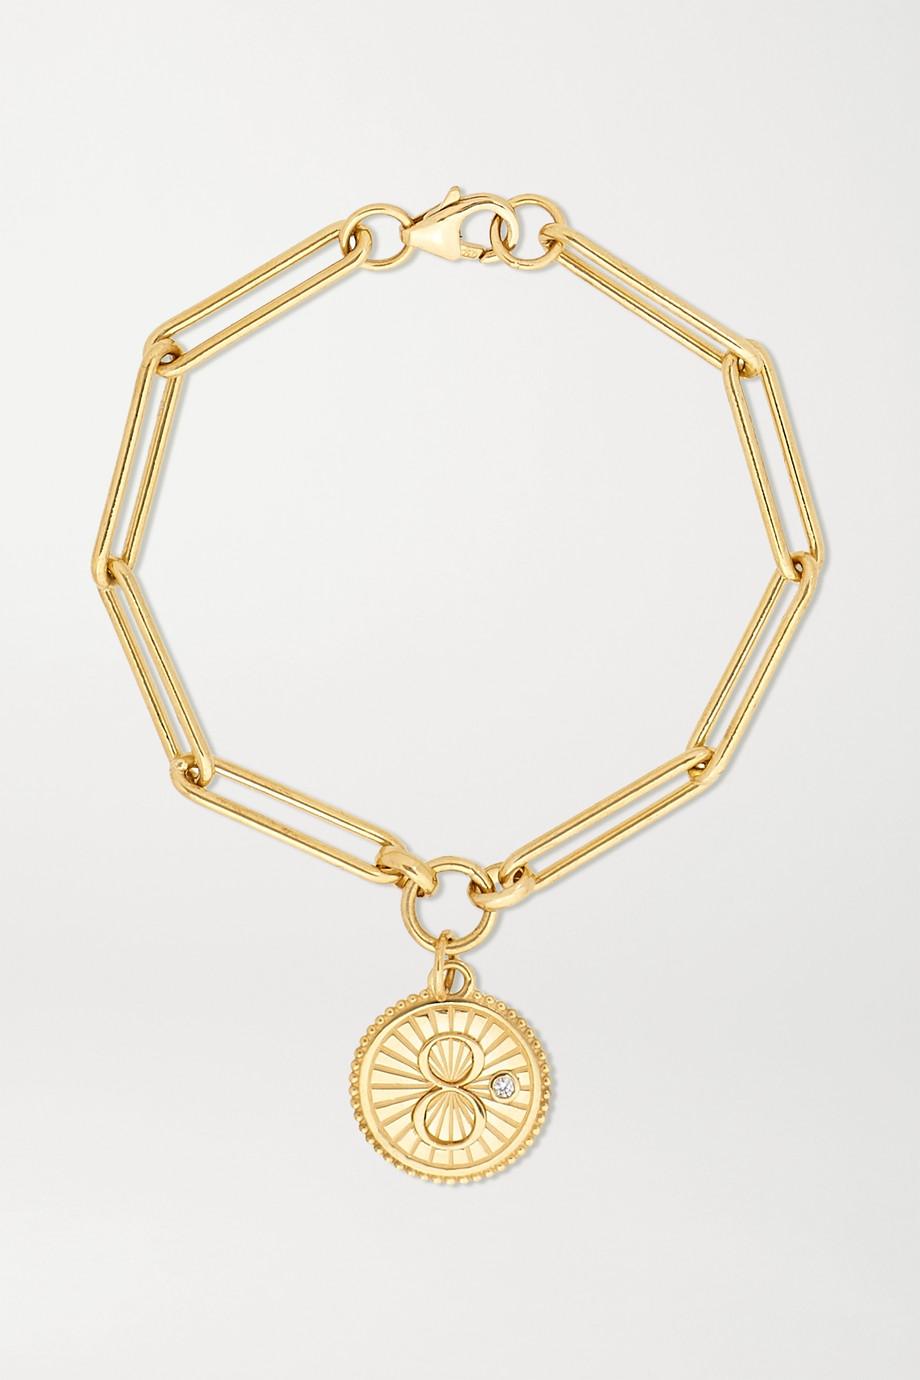 Foundrae Karma Armband aus 18 Karat Gold mit Diamant